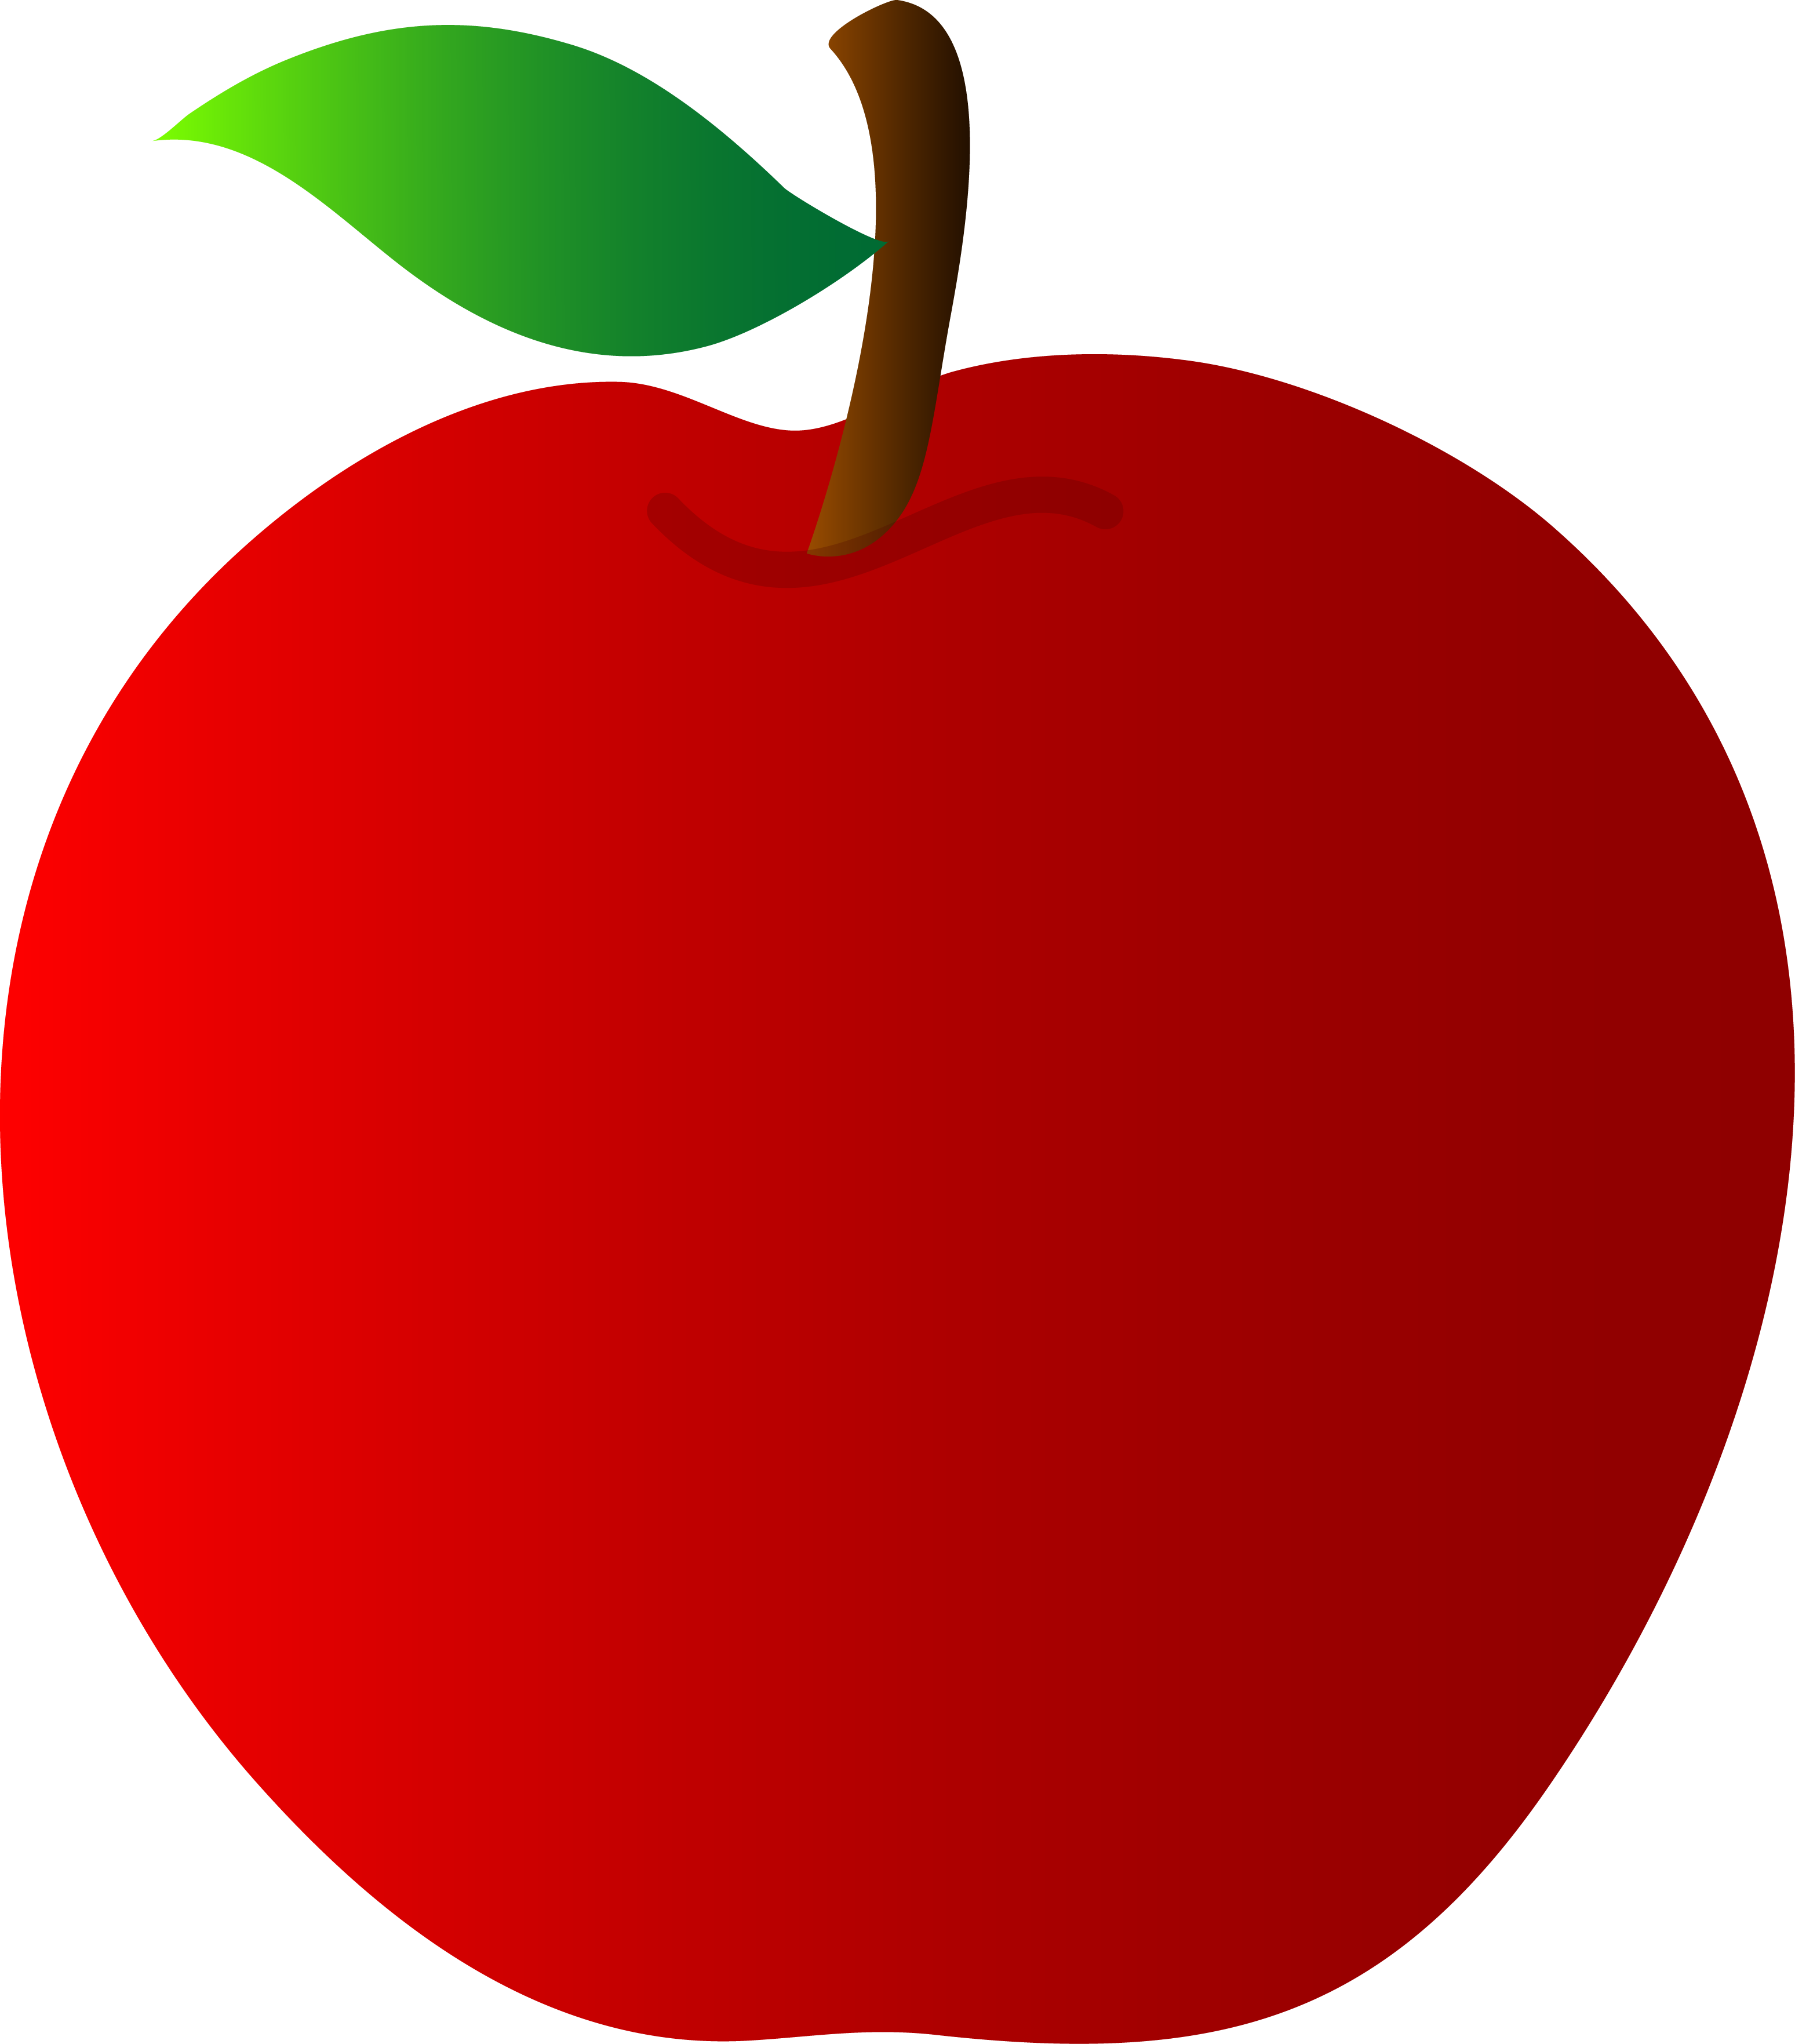 Red Apple Vector Art Free Clip Art Apple Clip Art Clip Art Apple Vector